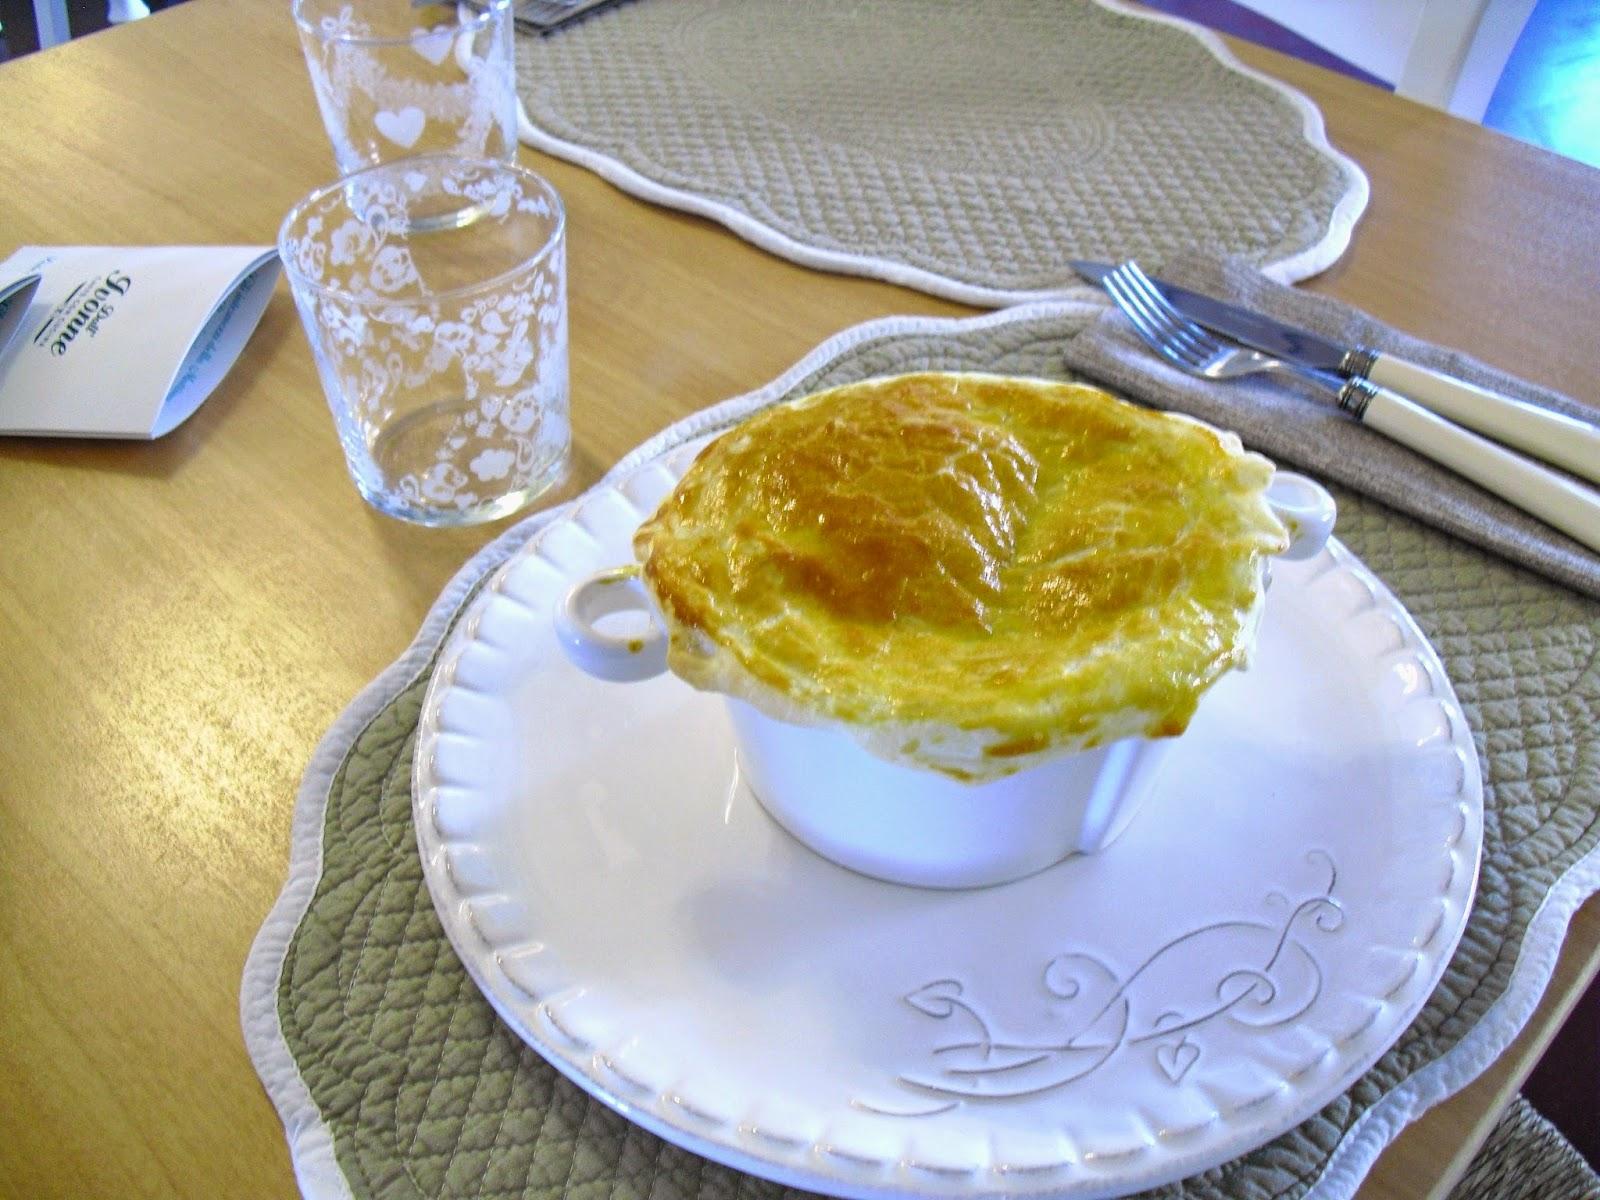 Dall 39 ivonne caff con cucina la terrina di verdure in sfoglia - Caffe cucina brescia ...